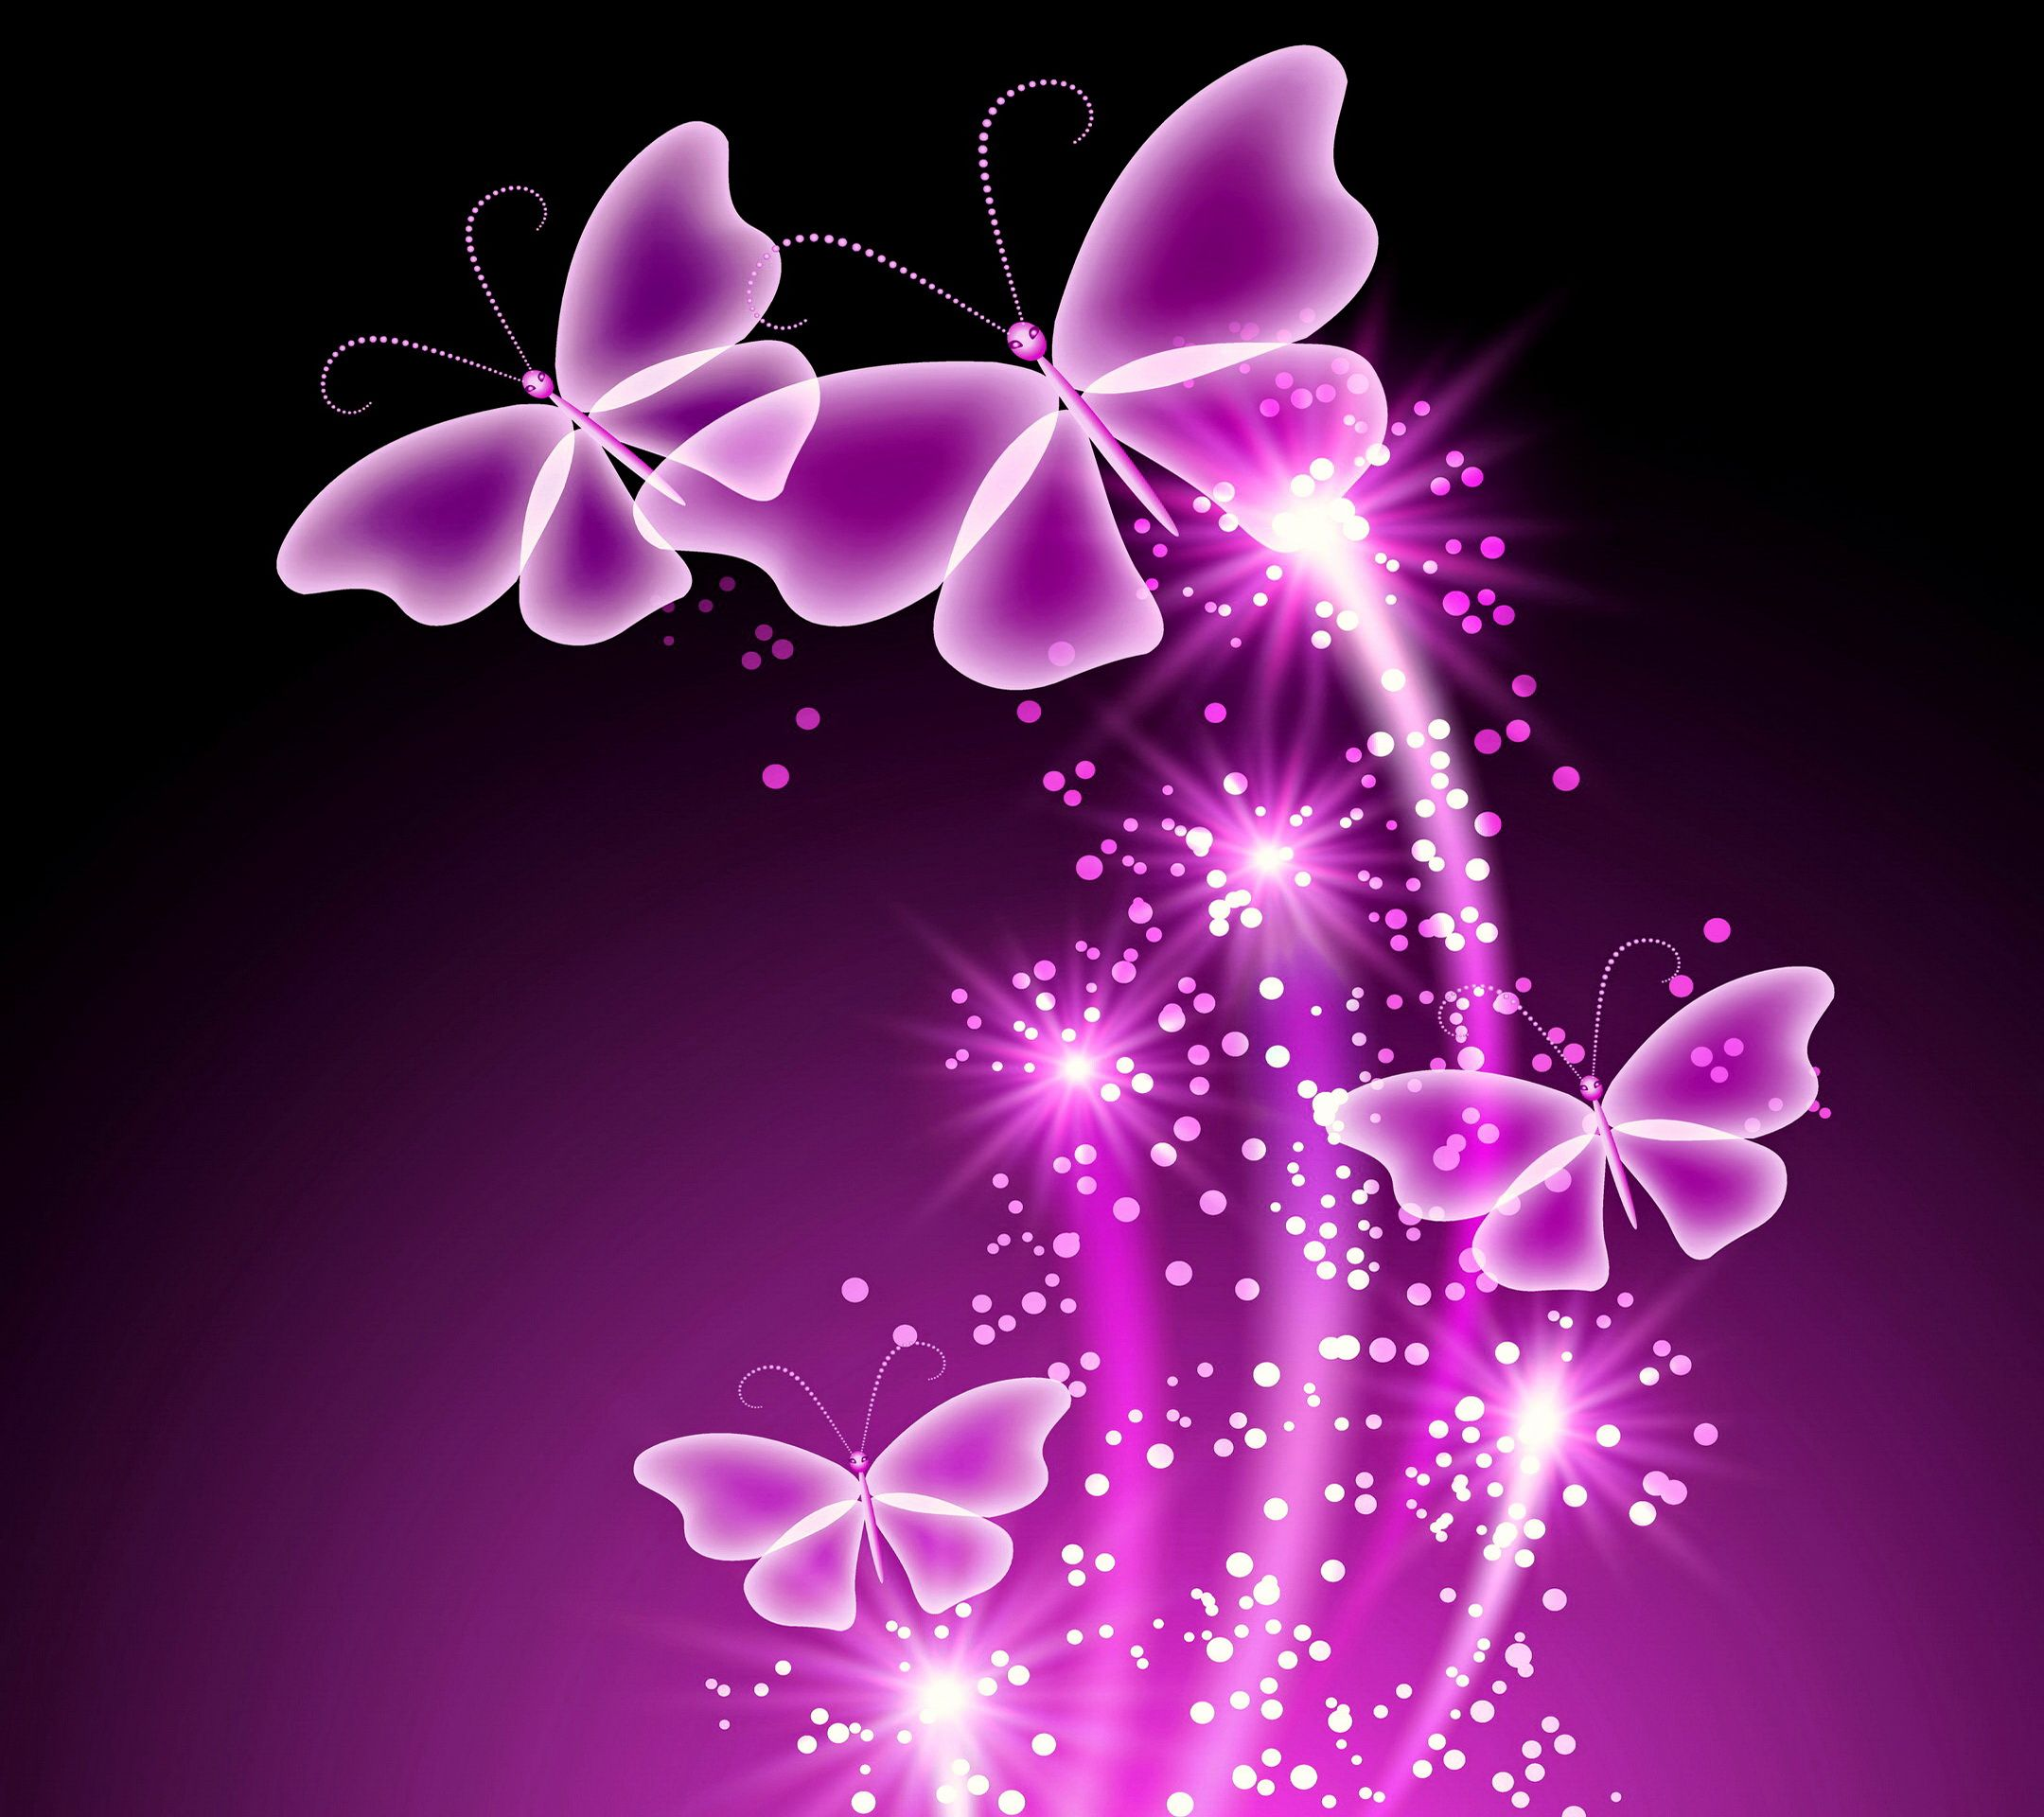 Neon Butterflies Deskt... Neon Butterfly Wallpaper